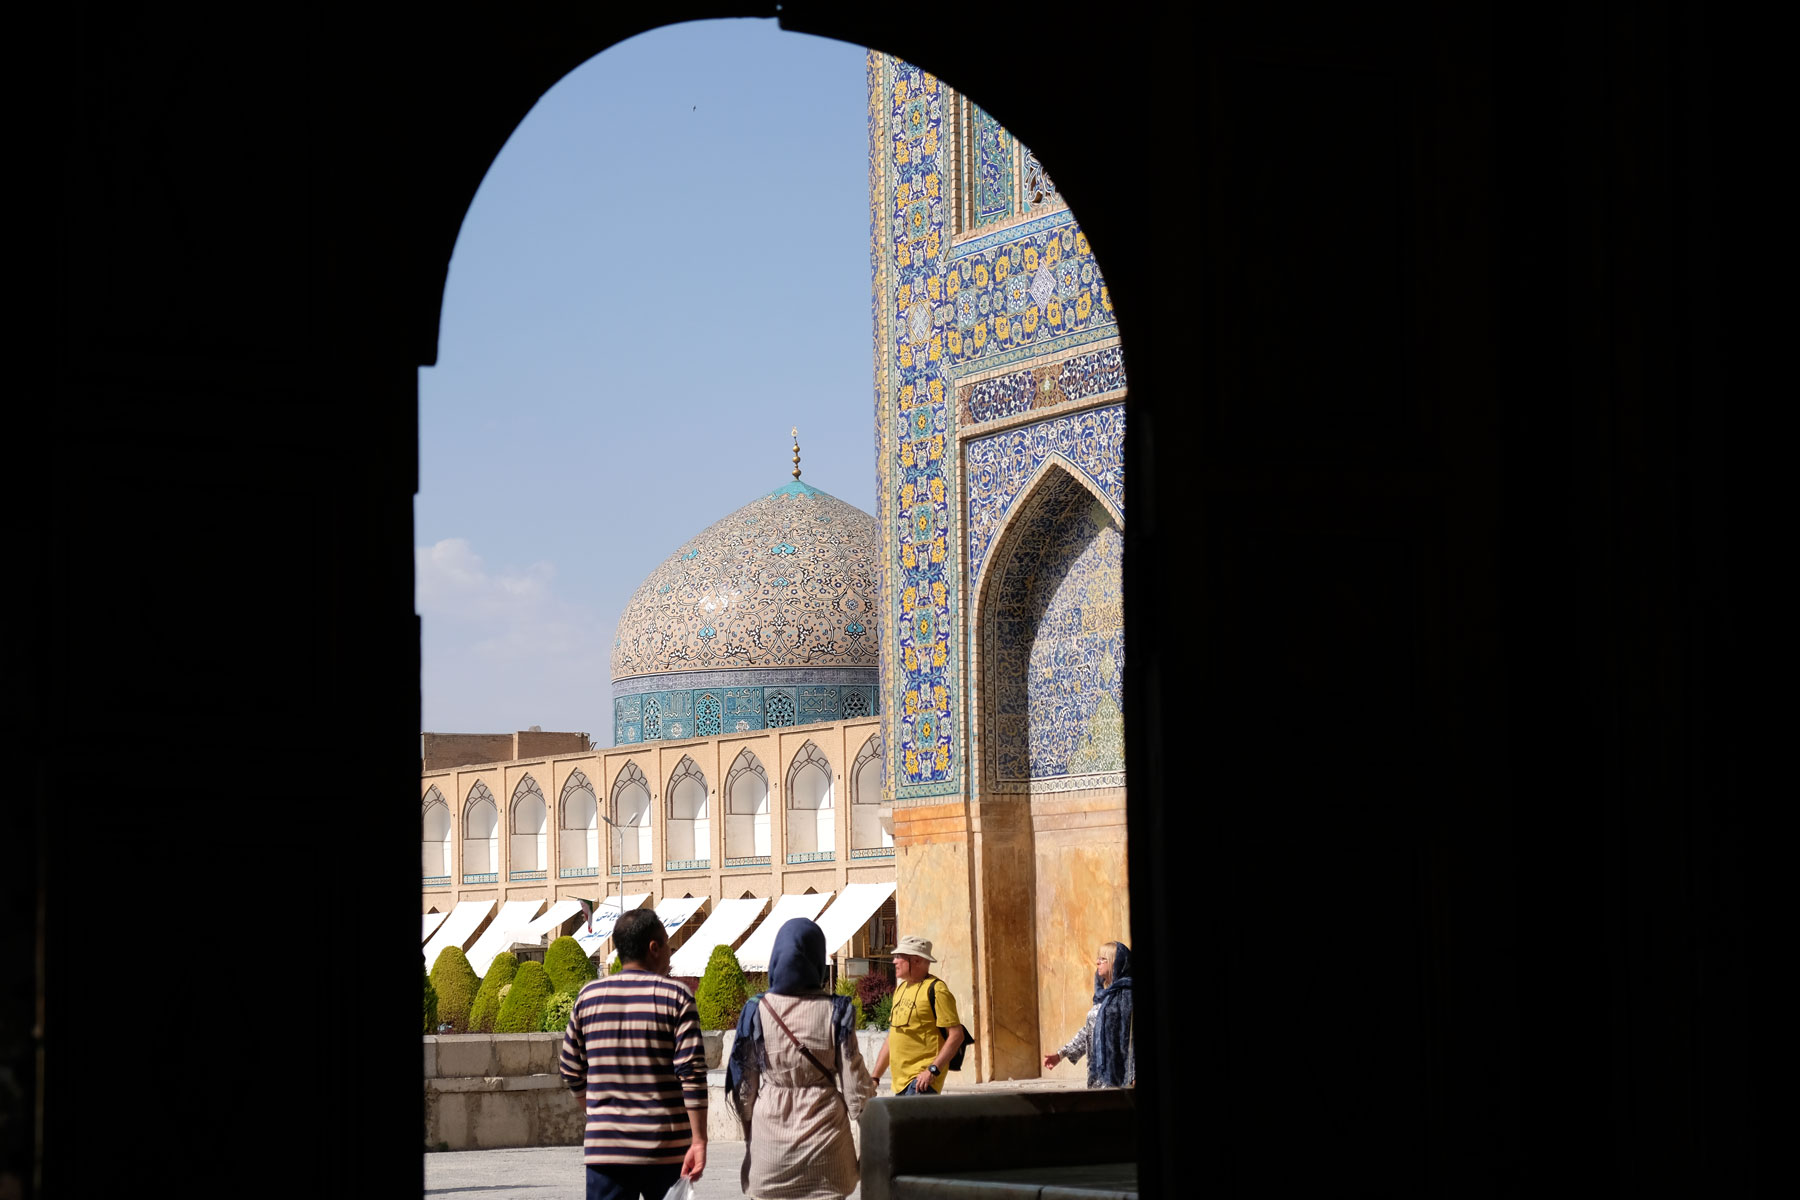 Kuppel der Imam-Moschee in Isfahan